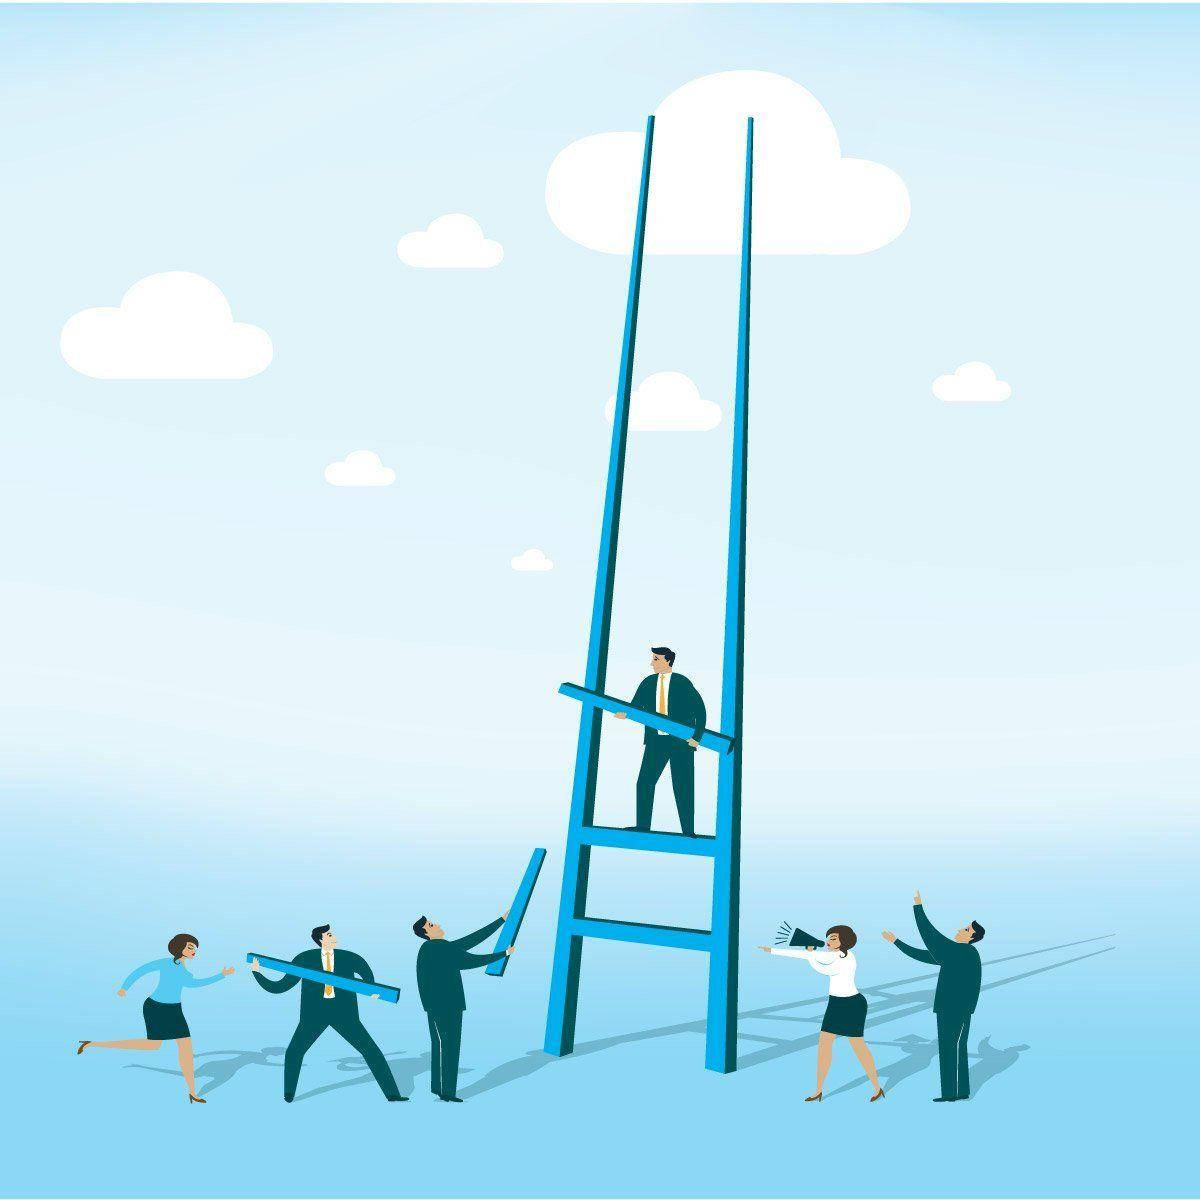 mag-aversa-winning-business-model-portfolio-1200-business